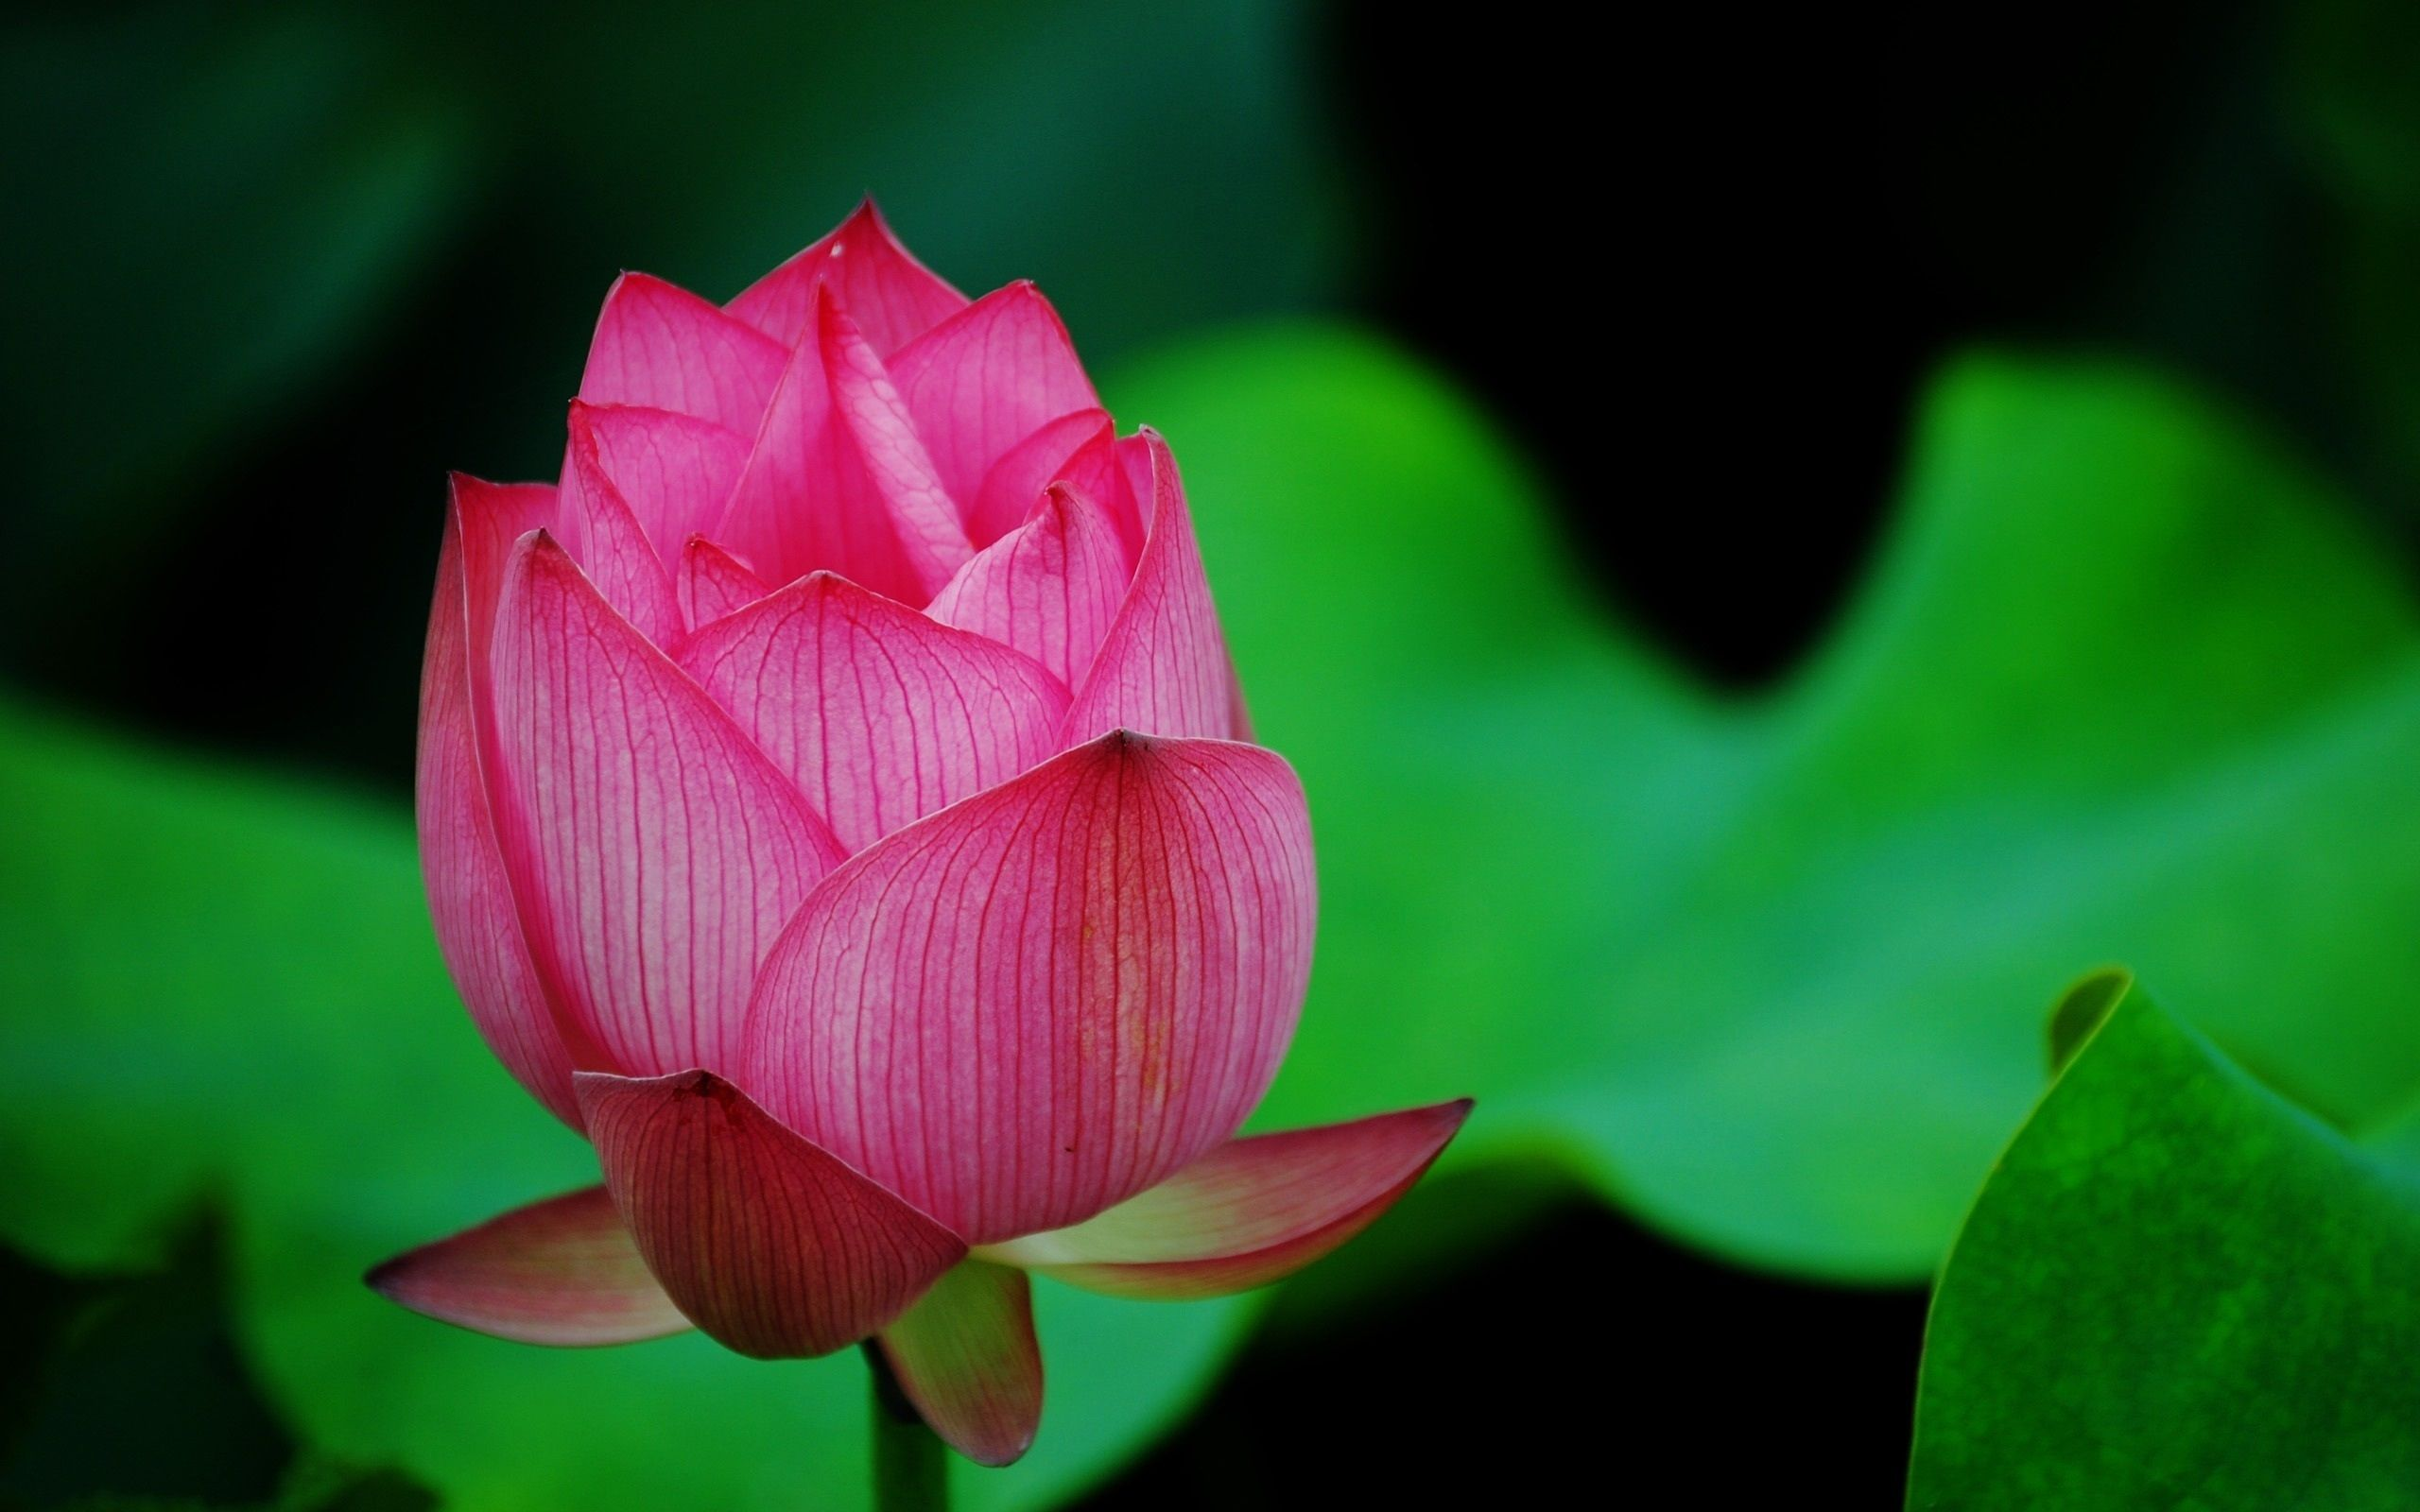 Blooming lotus flower hd wallpaper louts flower pinterest blooming lotus flower hd wallpaper izmirmasajfo